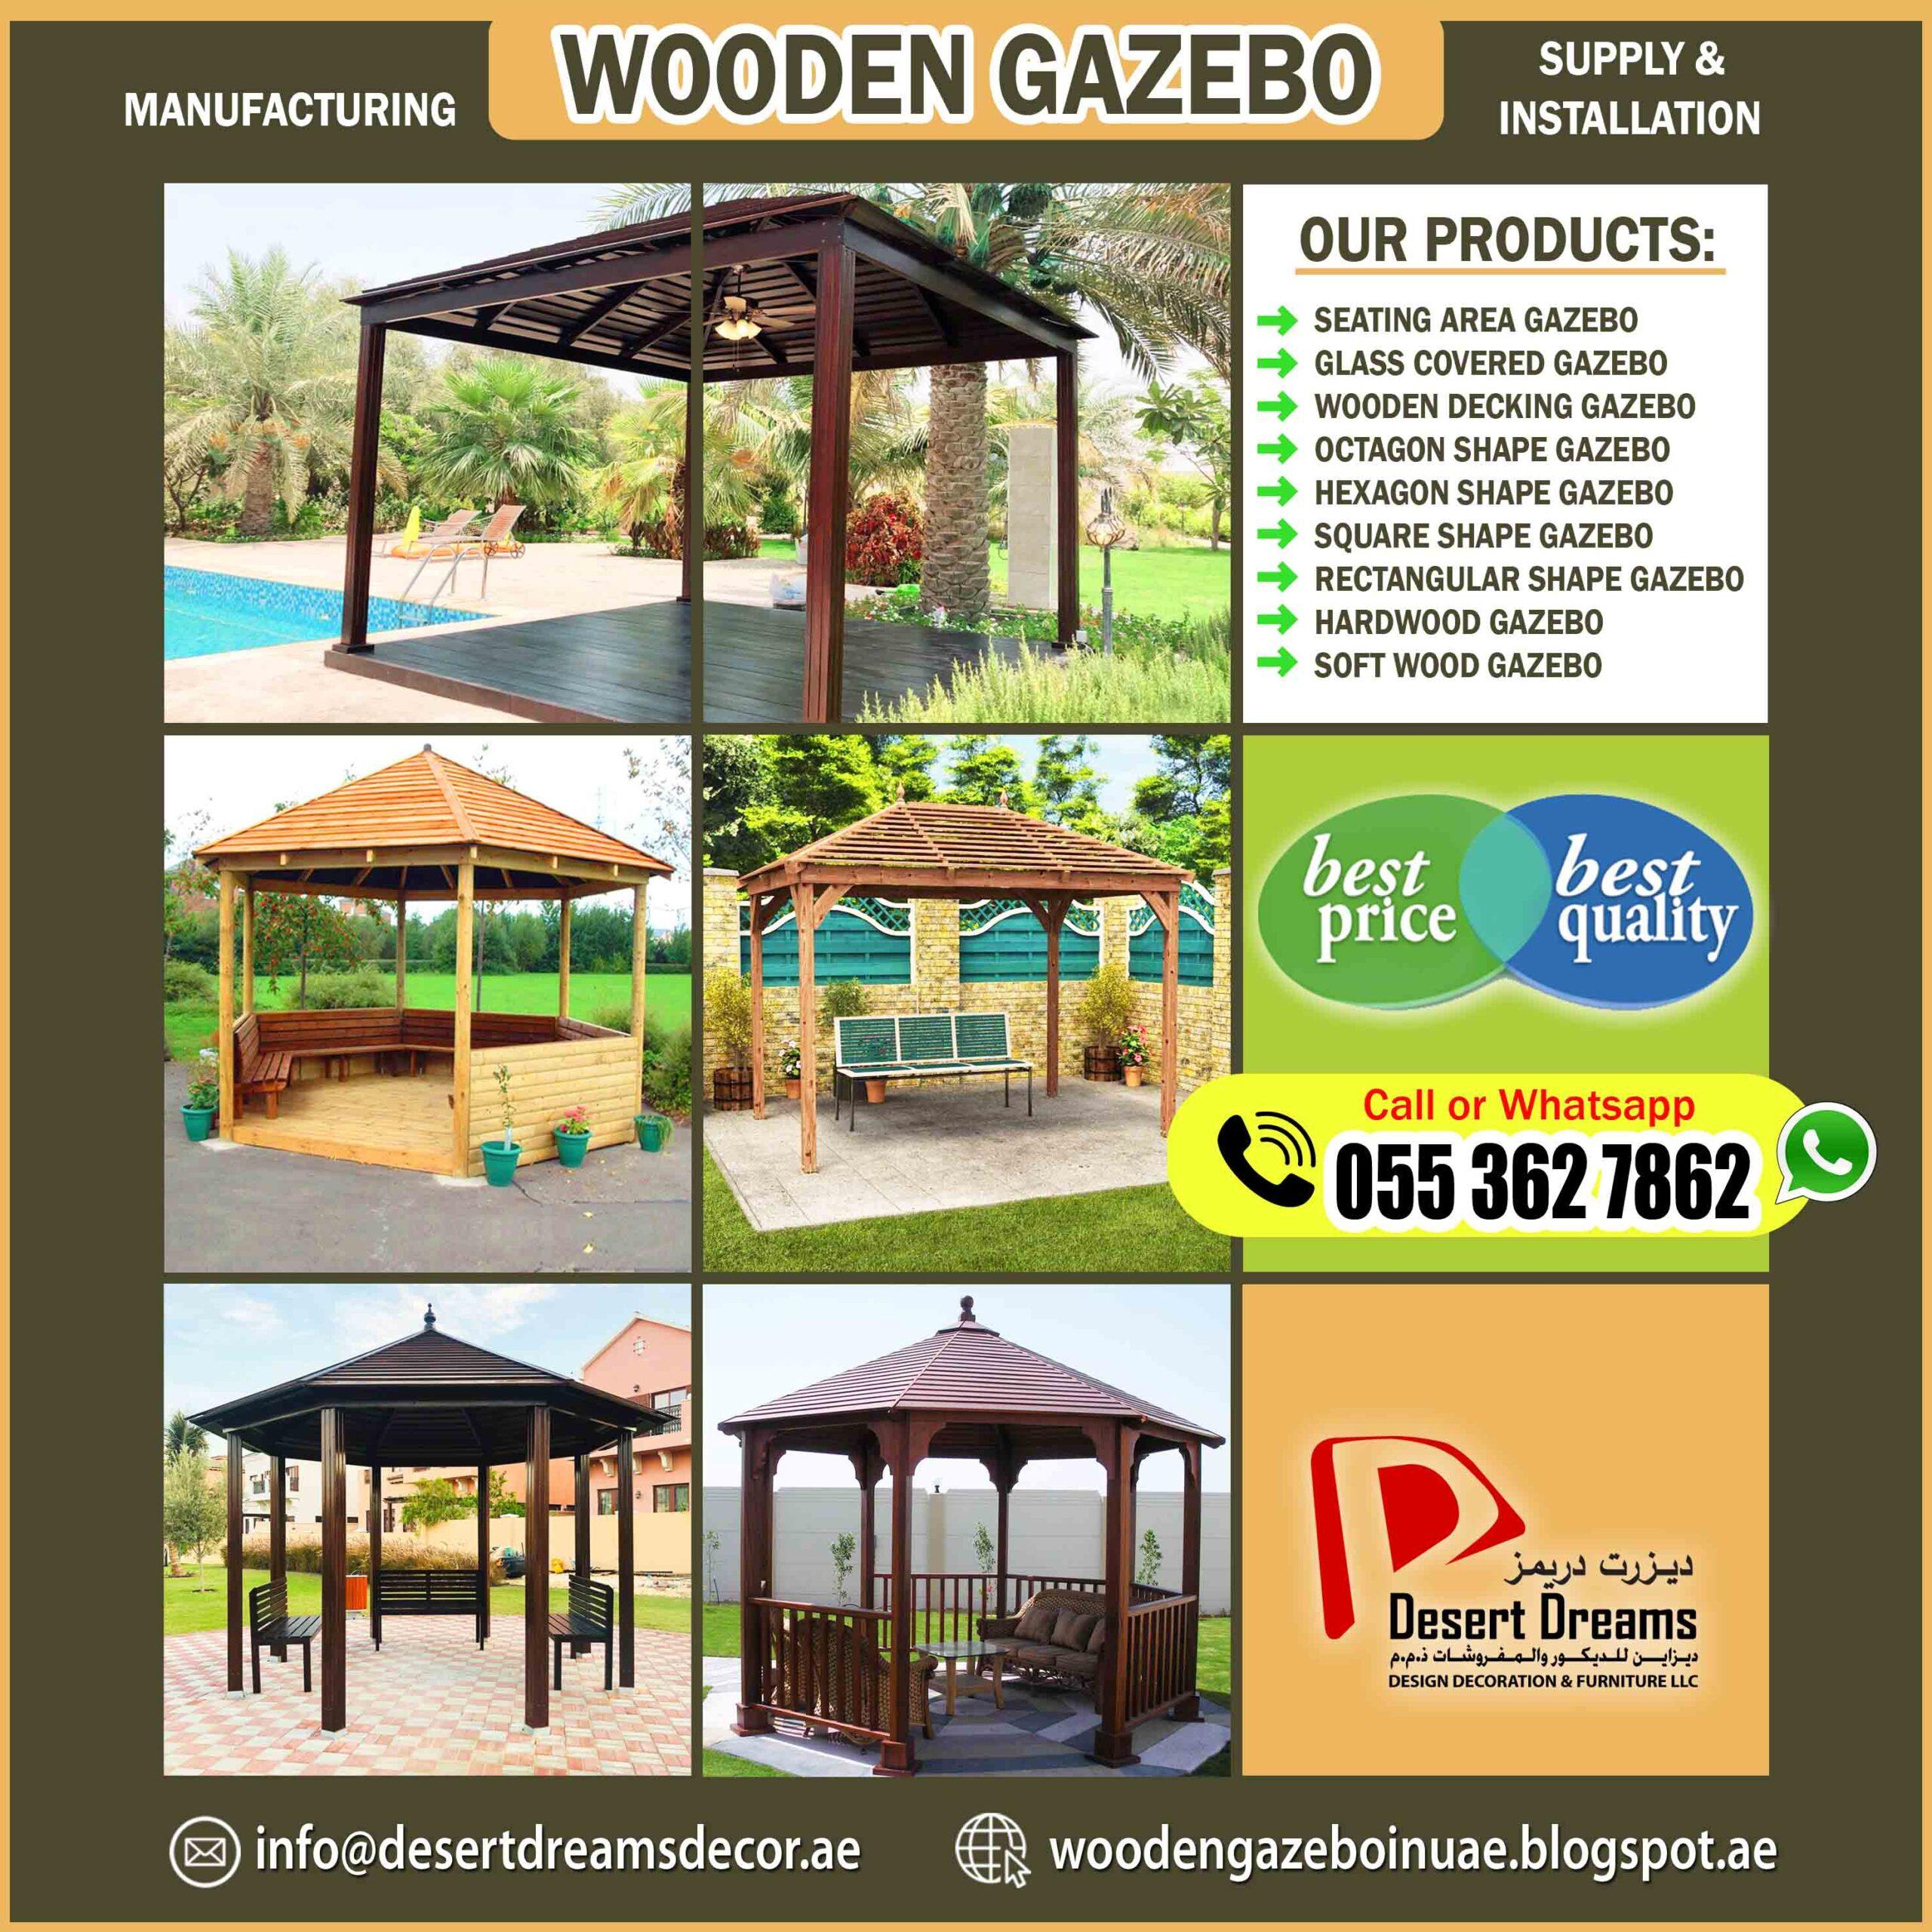 Supply and Install Wooden Gazebo in UAE.jpg